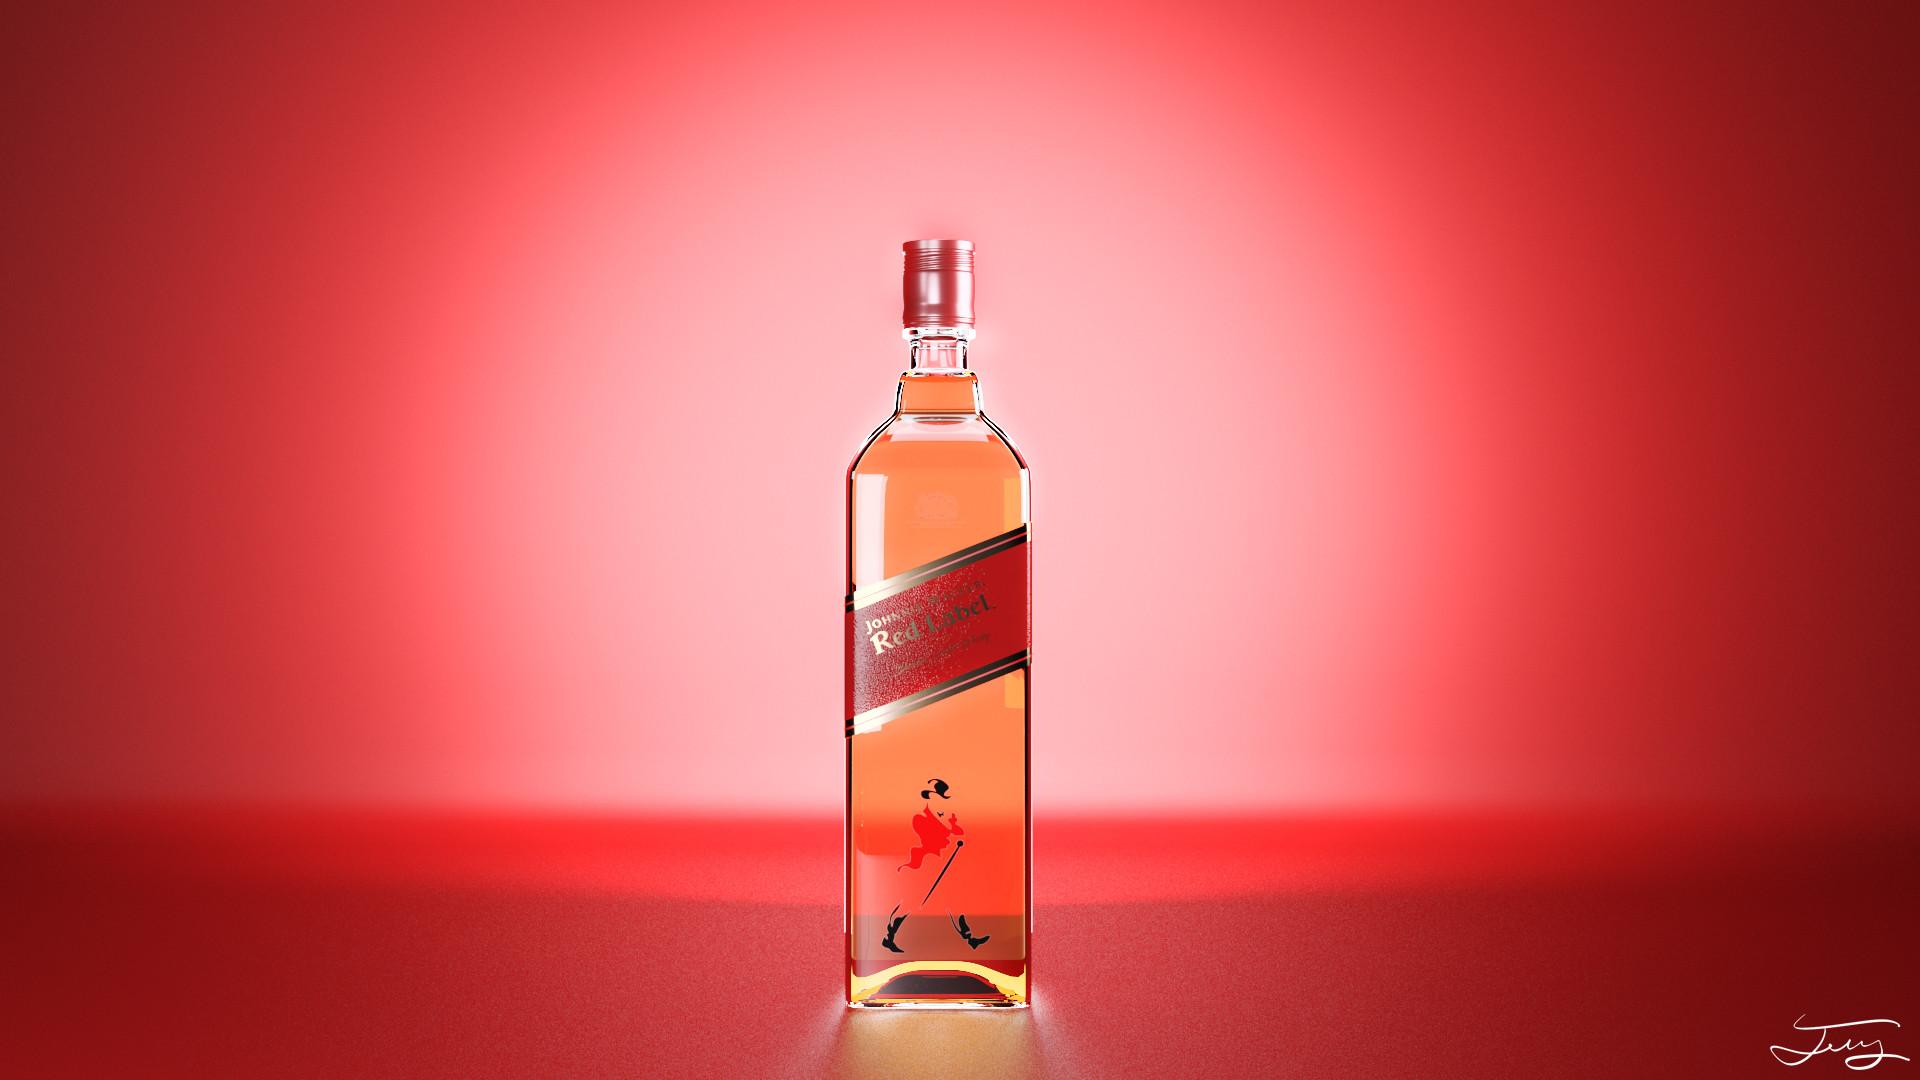 About >> ArtStation - Johnnie Walker Red Label - Blended Scotch Whisky, Hyunwoo Jung